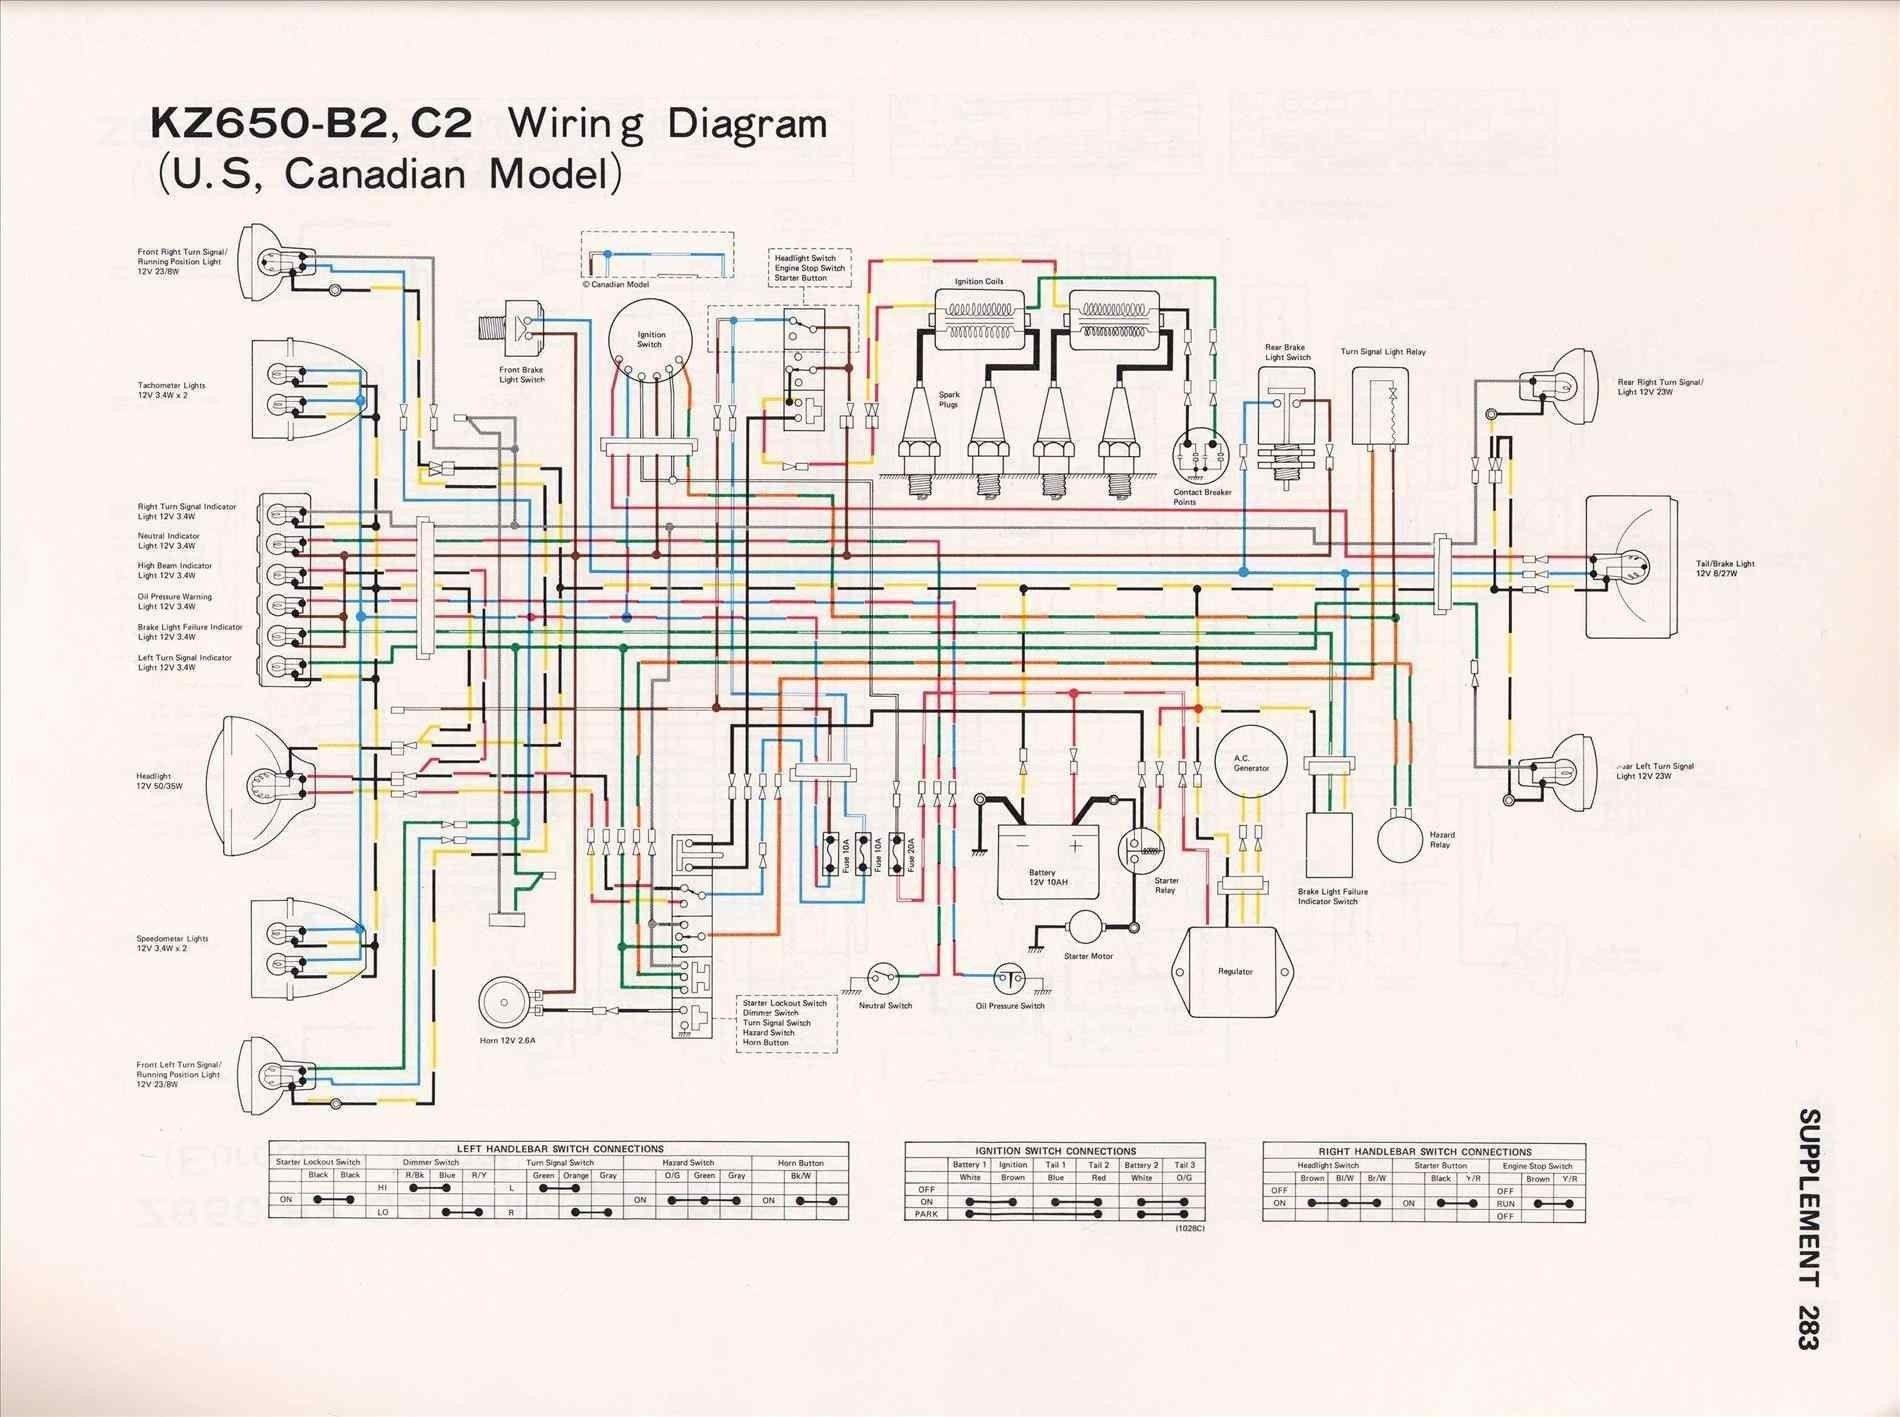 [FPER_4992]  2020 Montana 5th Wheel Floor Plans in 2020   Electrical wiring diagram,  Diagram, Engineering   Kawasaki 1300 Wiring Diagram      Pinterest